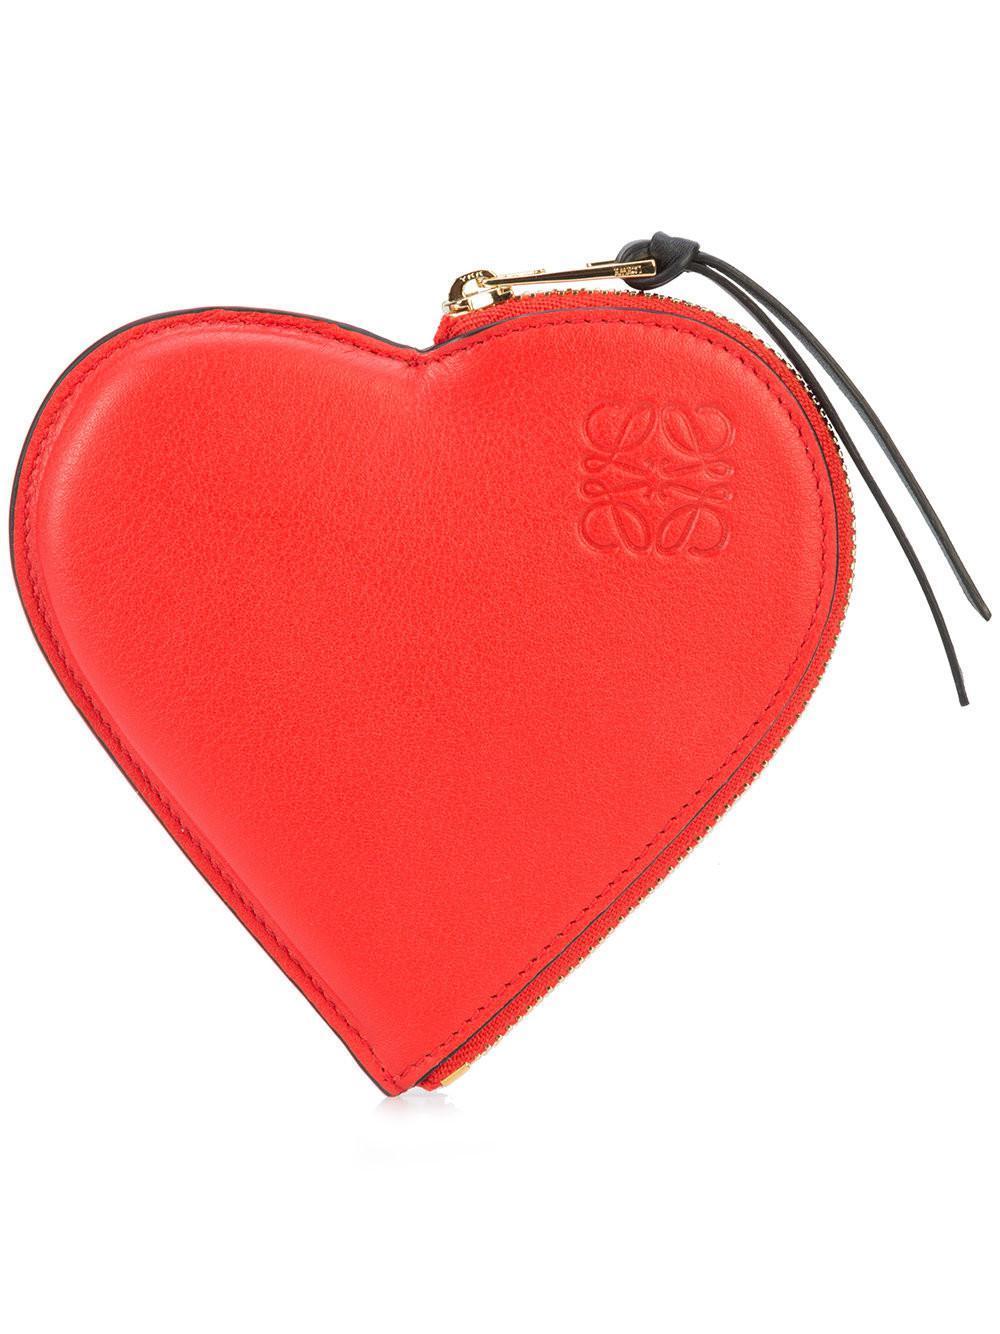 Loewe Heart shaped purse uFuxC4jYE